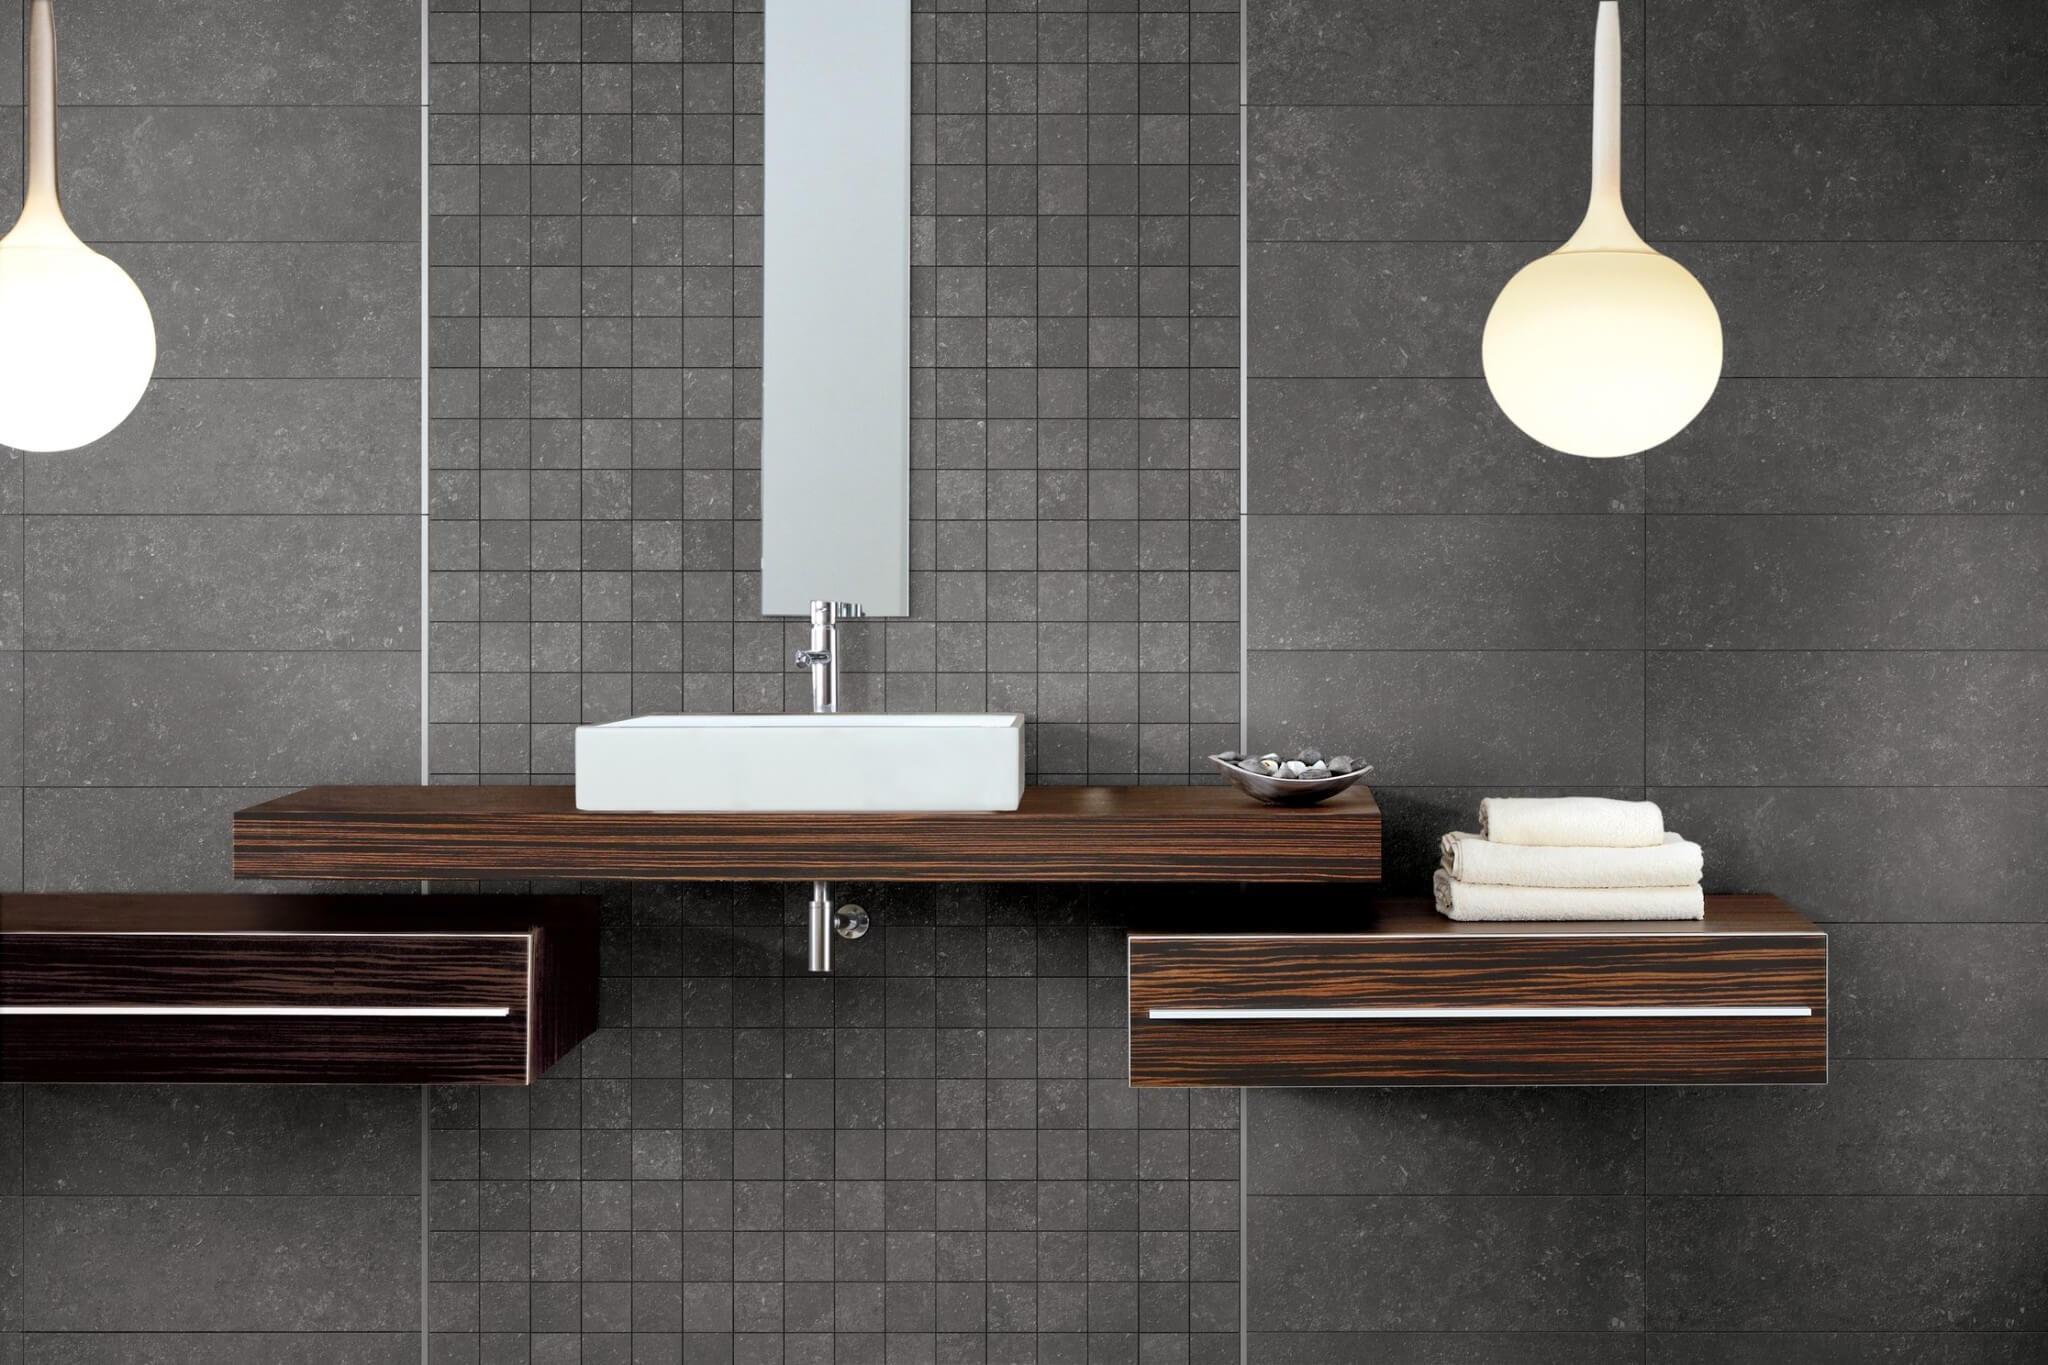 Mooie Keuken Tegels : Faience tegel voor badkamer en keuken – Gilbo tegels